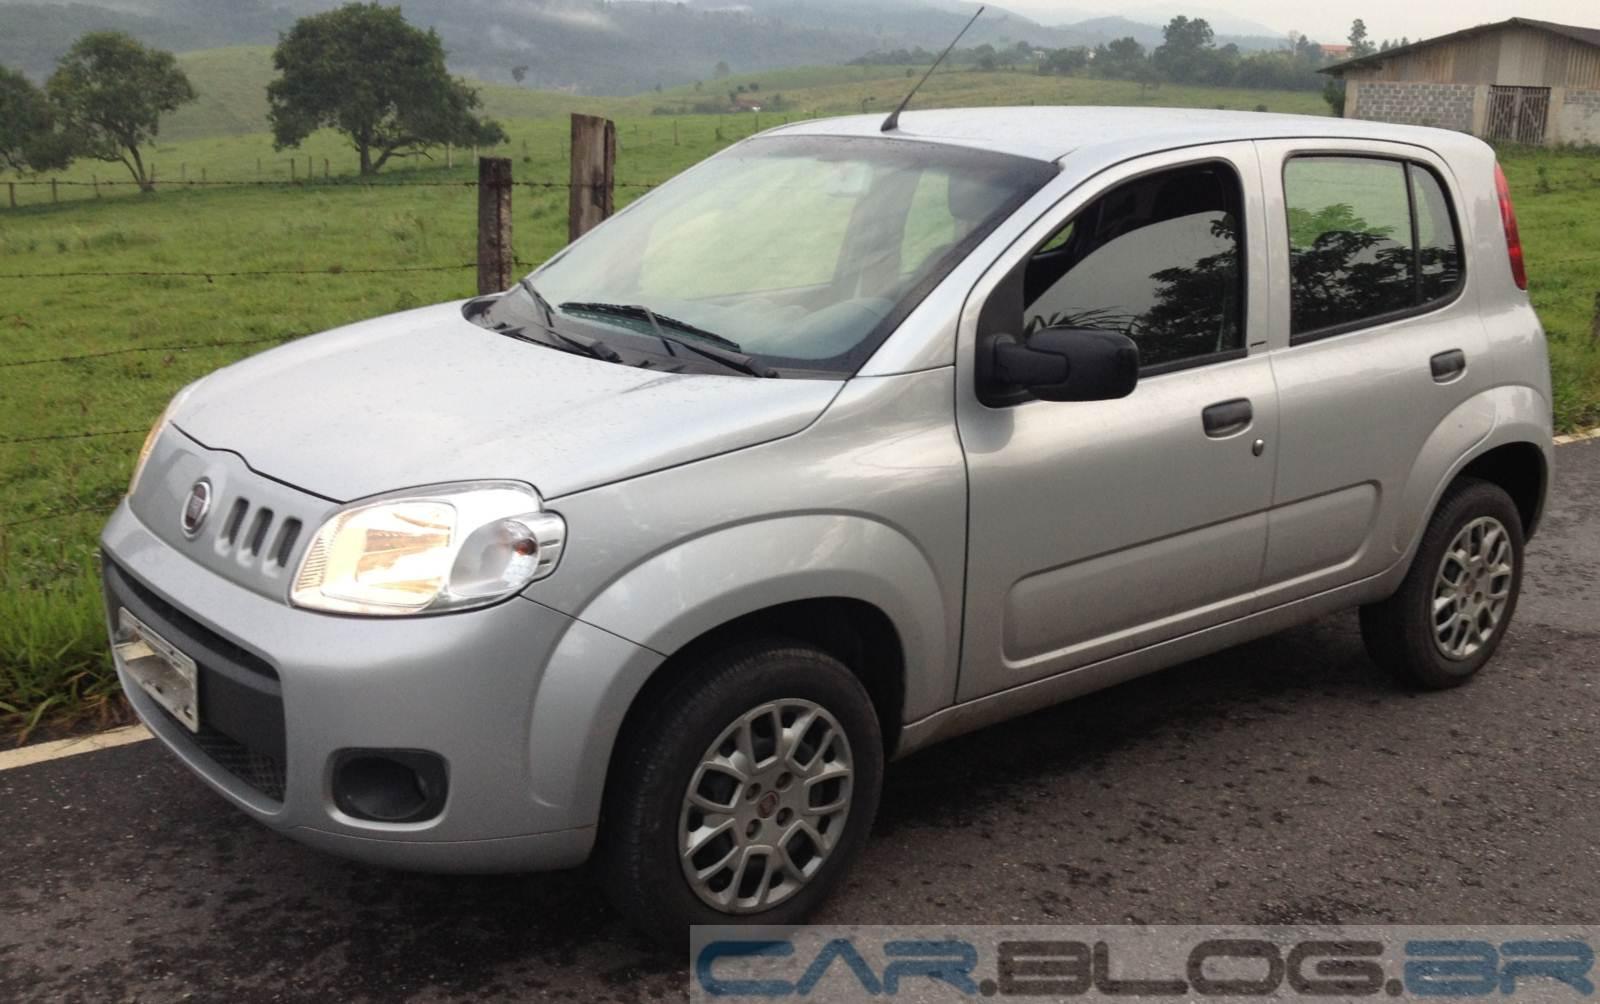 Fiat Uno x Volkswagen up! - comparativo